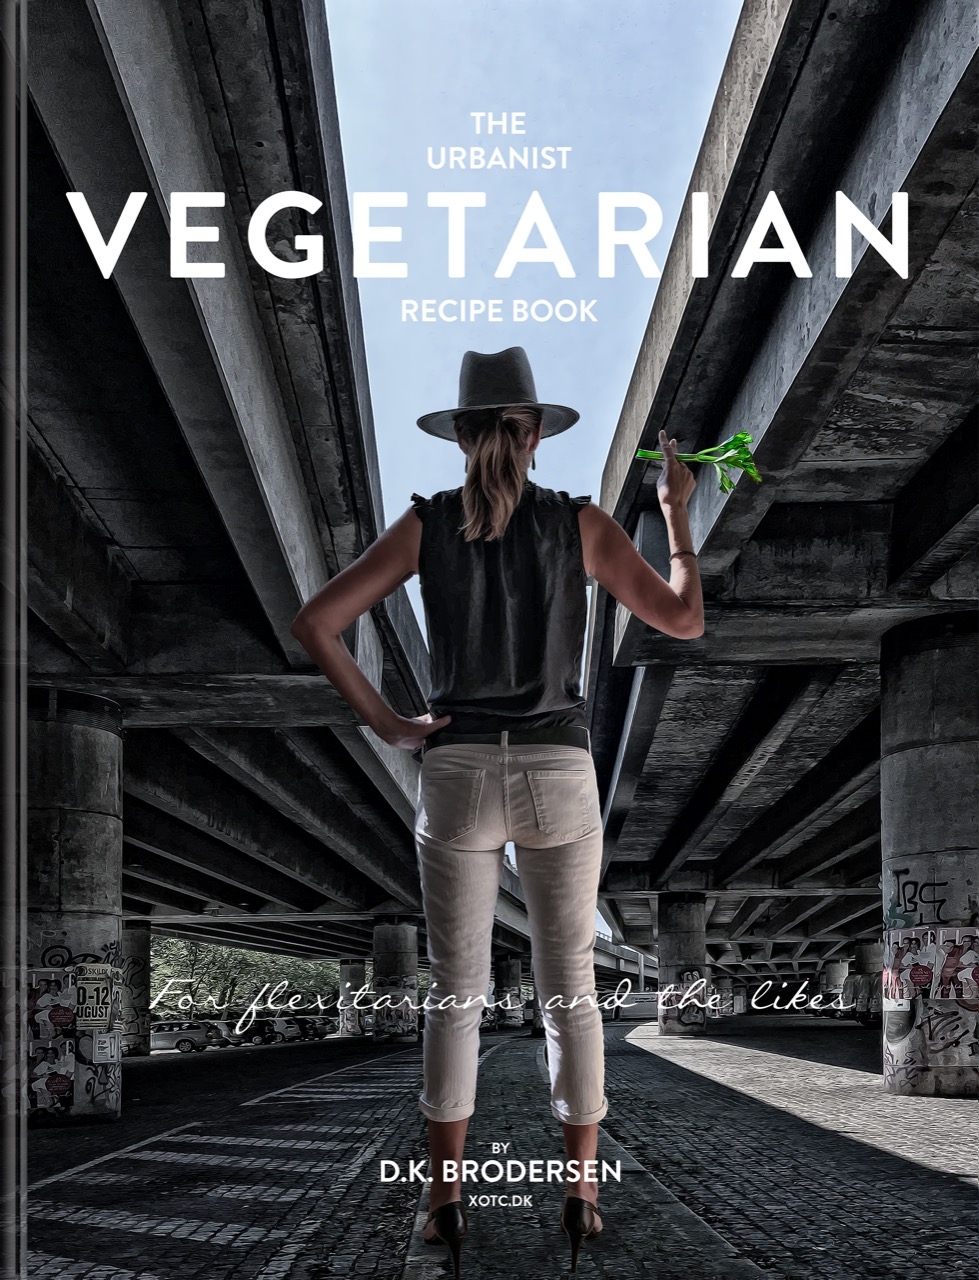 The Urbanist Vegetarian Recipe Book